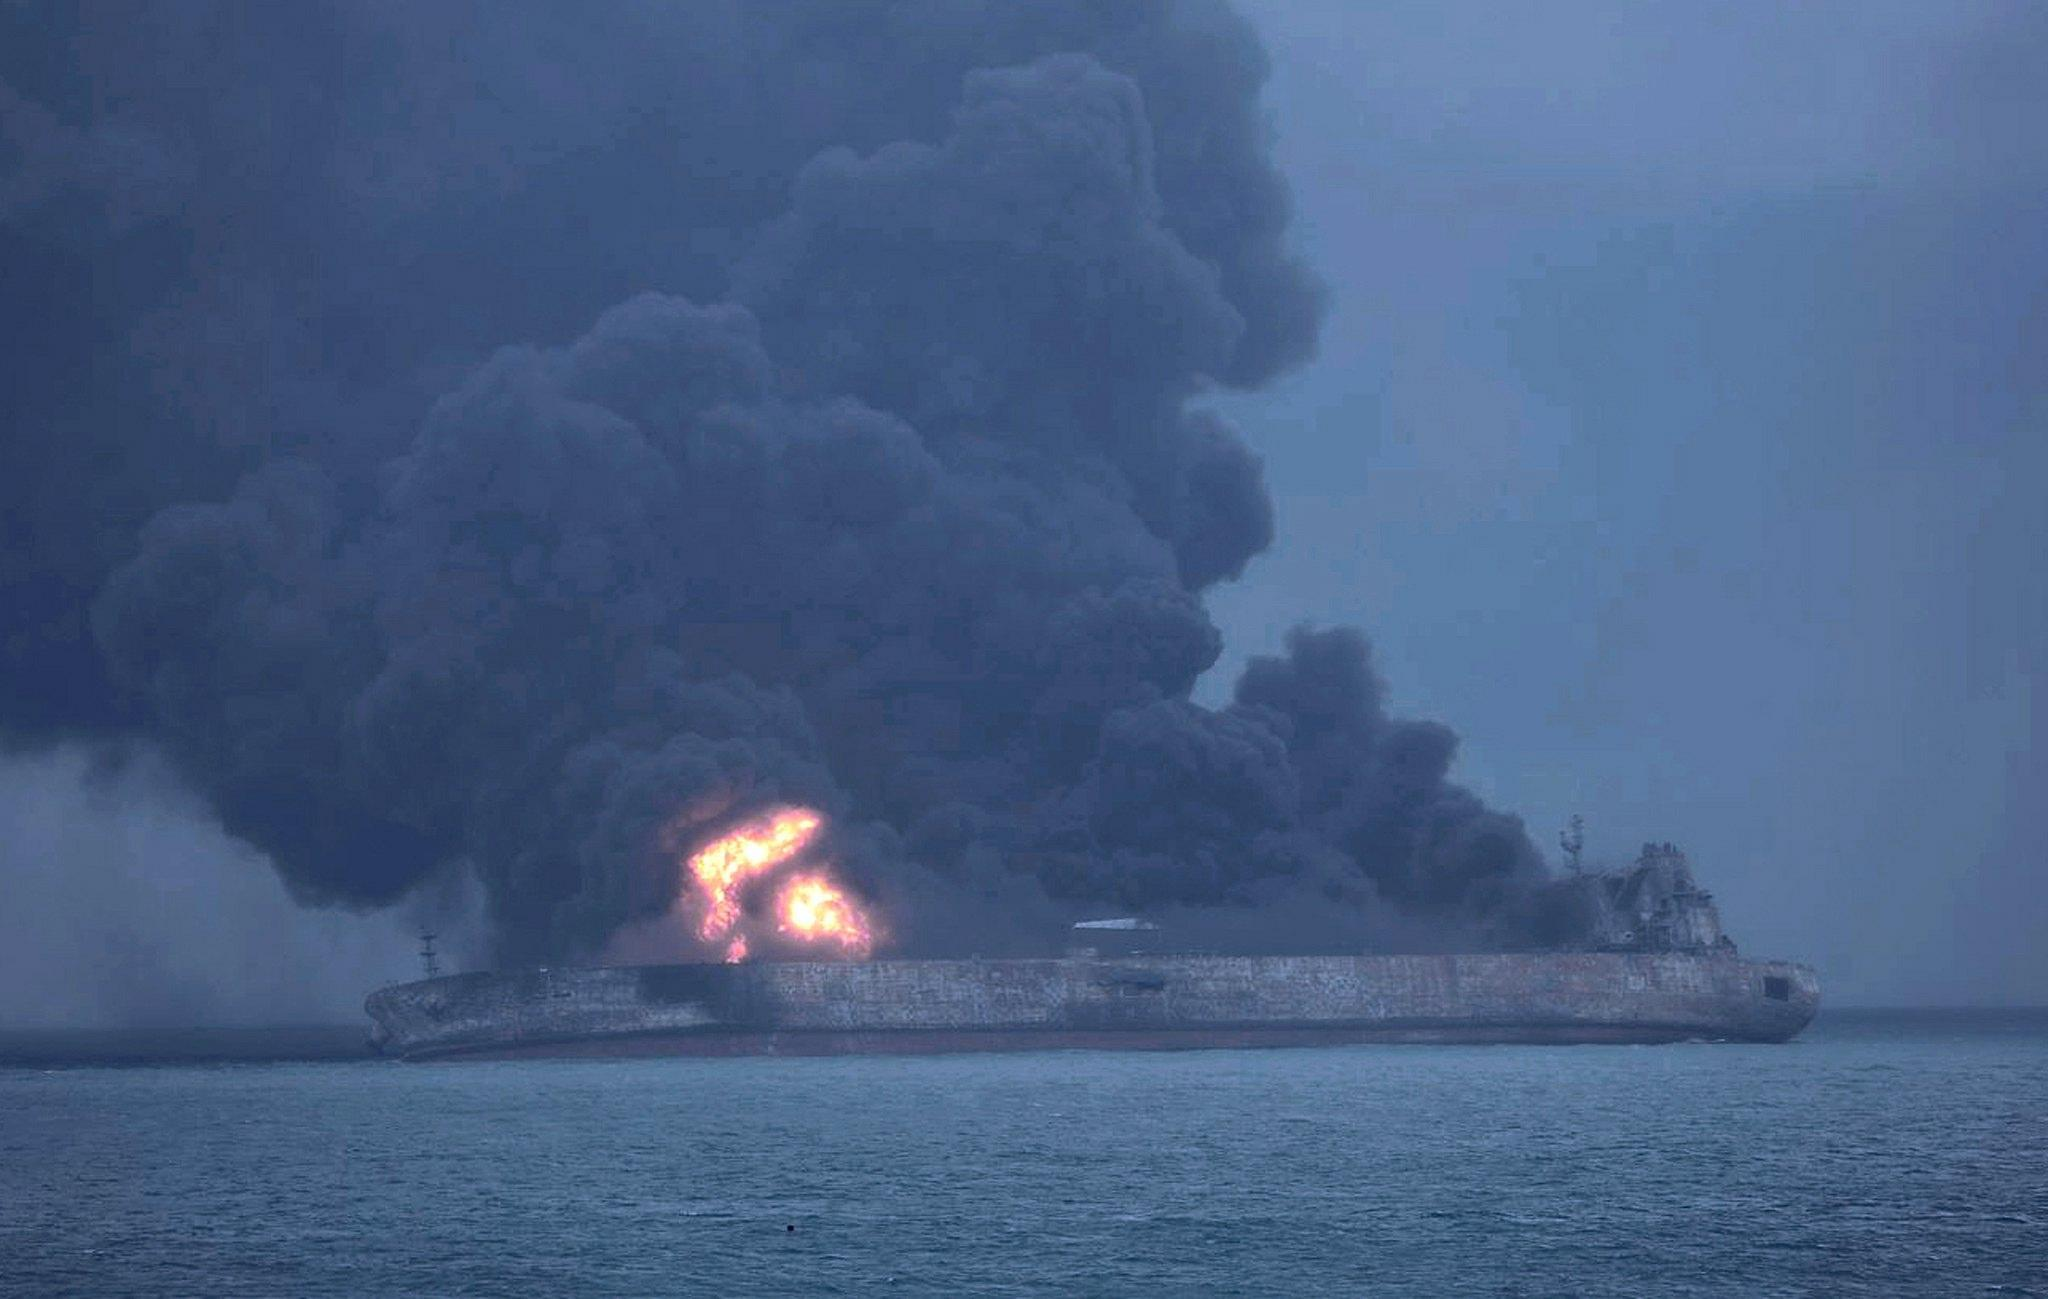 Cina: petroliera Iran rischia esplosione